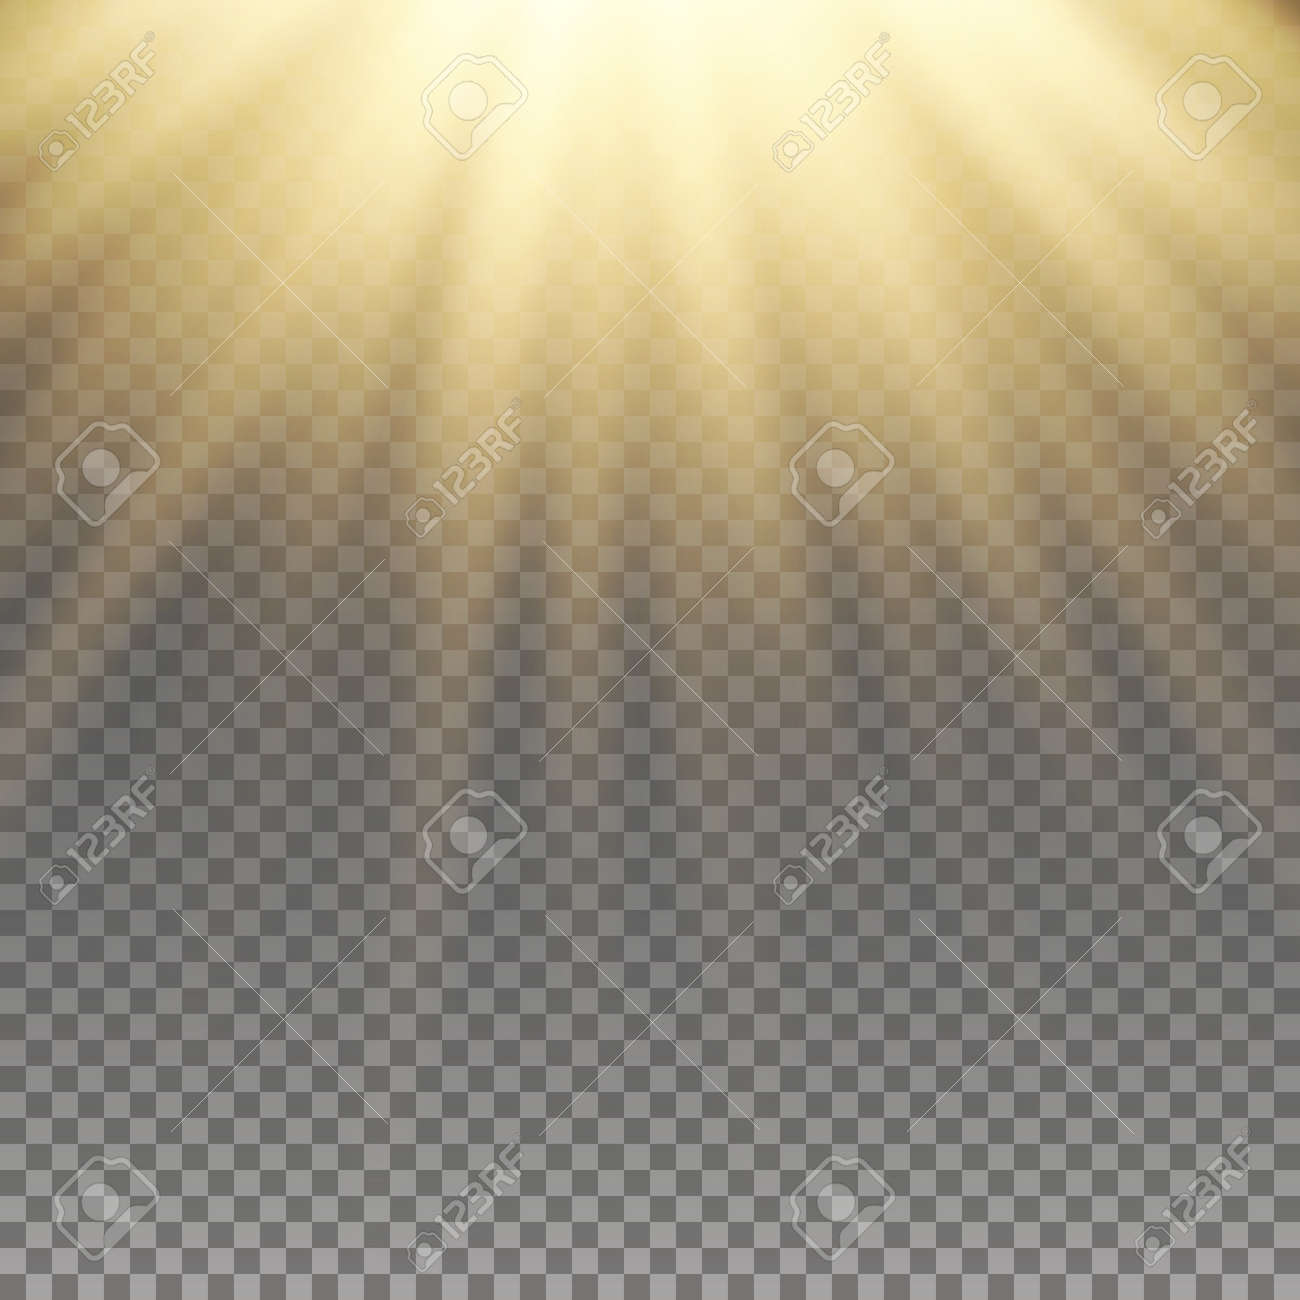 Yellow warm light effect, sun rays, beams on transparent background. Vector illustration. - 53072393